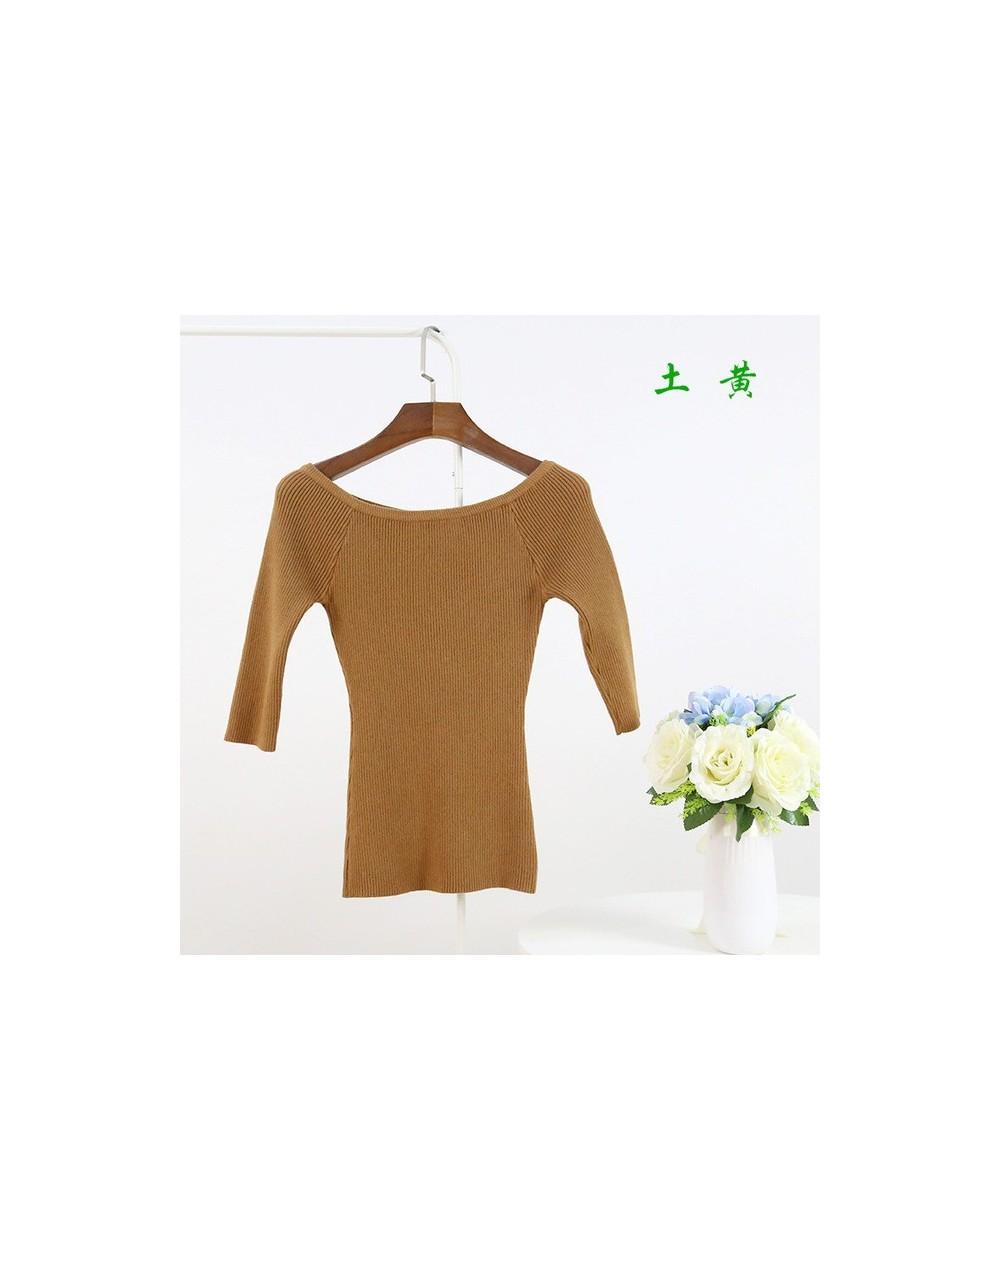 Sweaters For Women Knitted Three Quarter Sleeve Slit Slash Neck Shirt Pullover Sweater Femme Tricot Pull Jumper Jumper - dar...